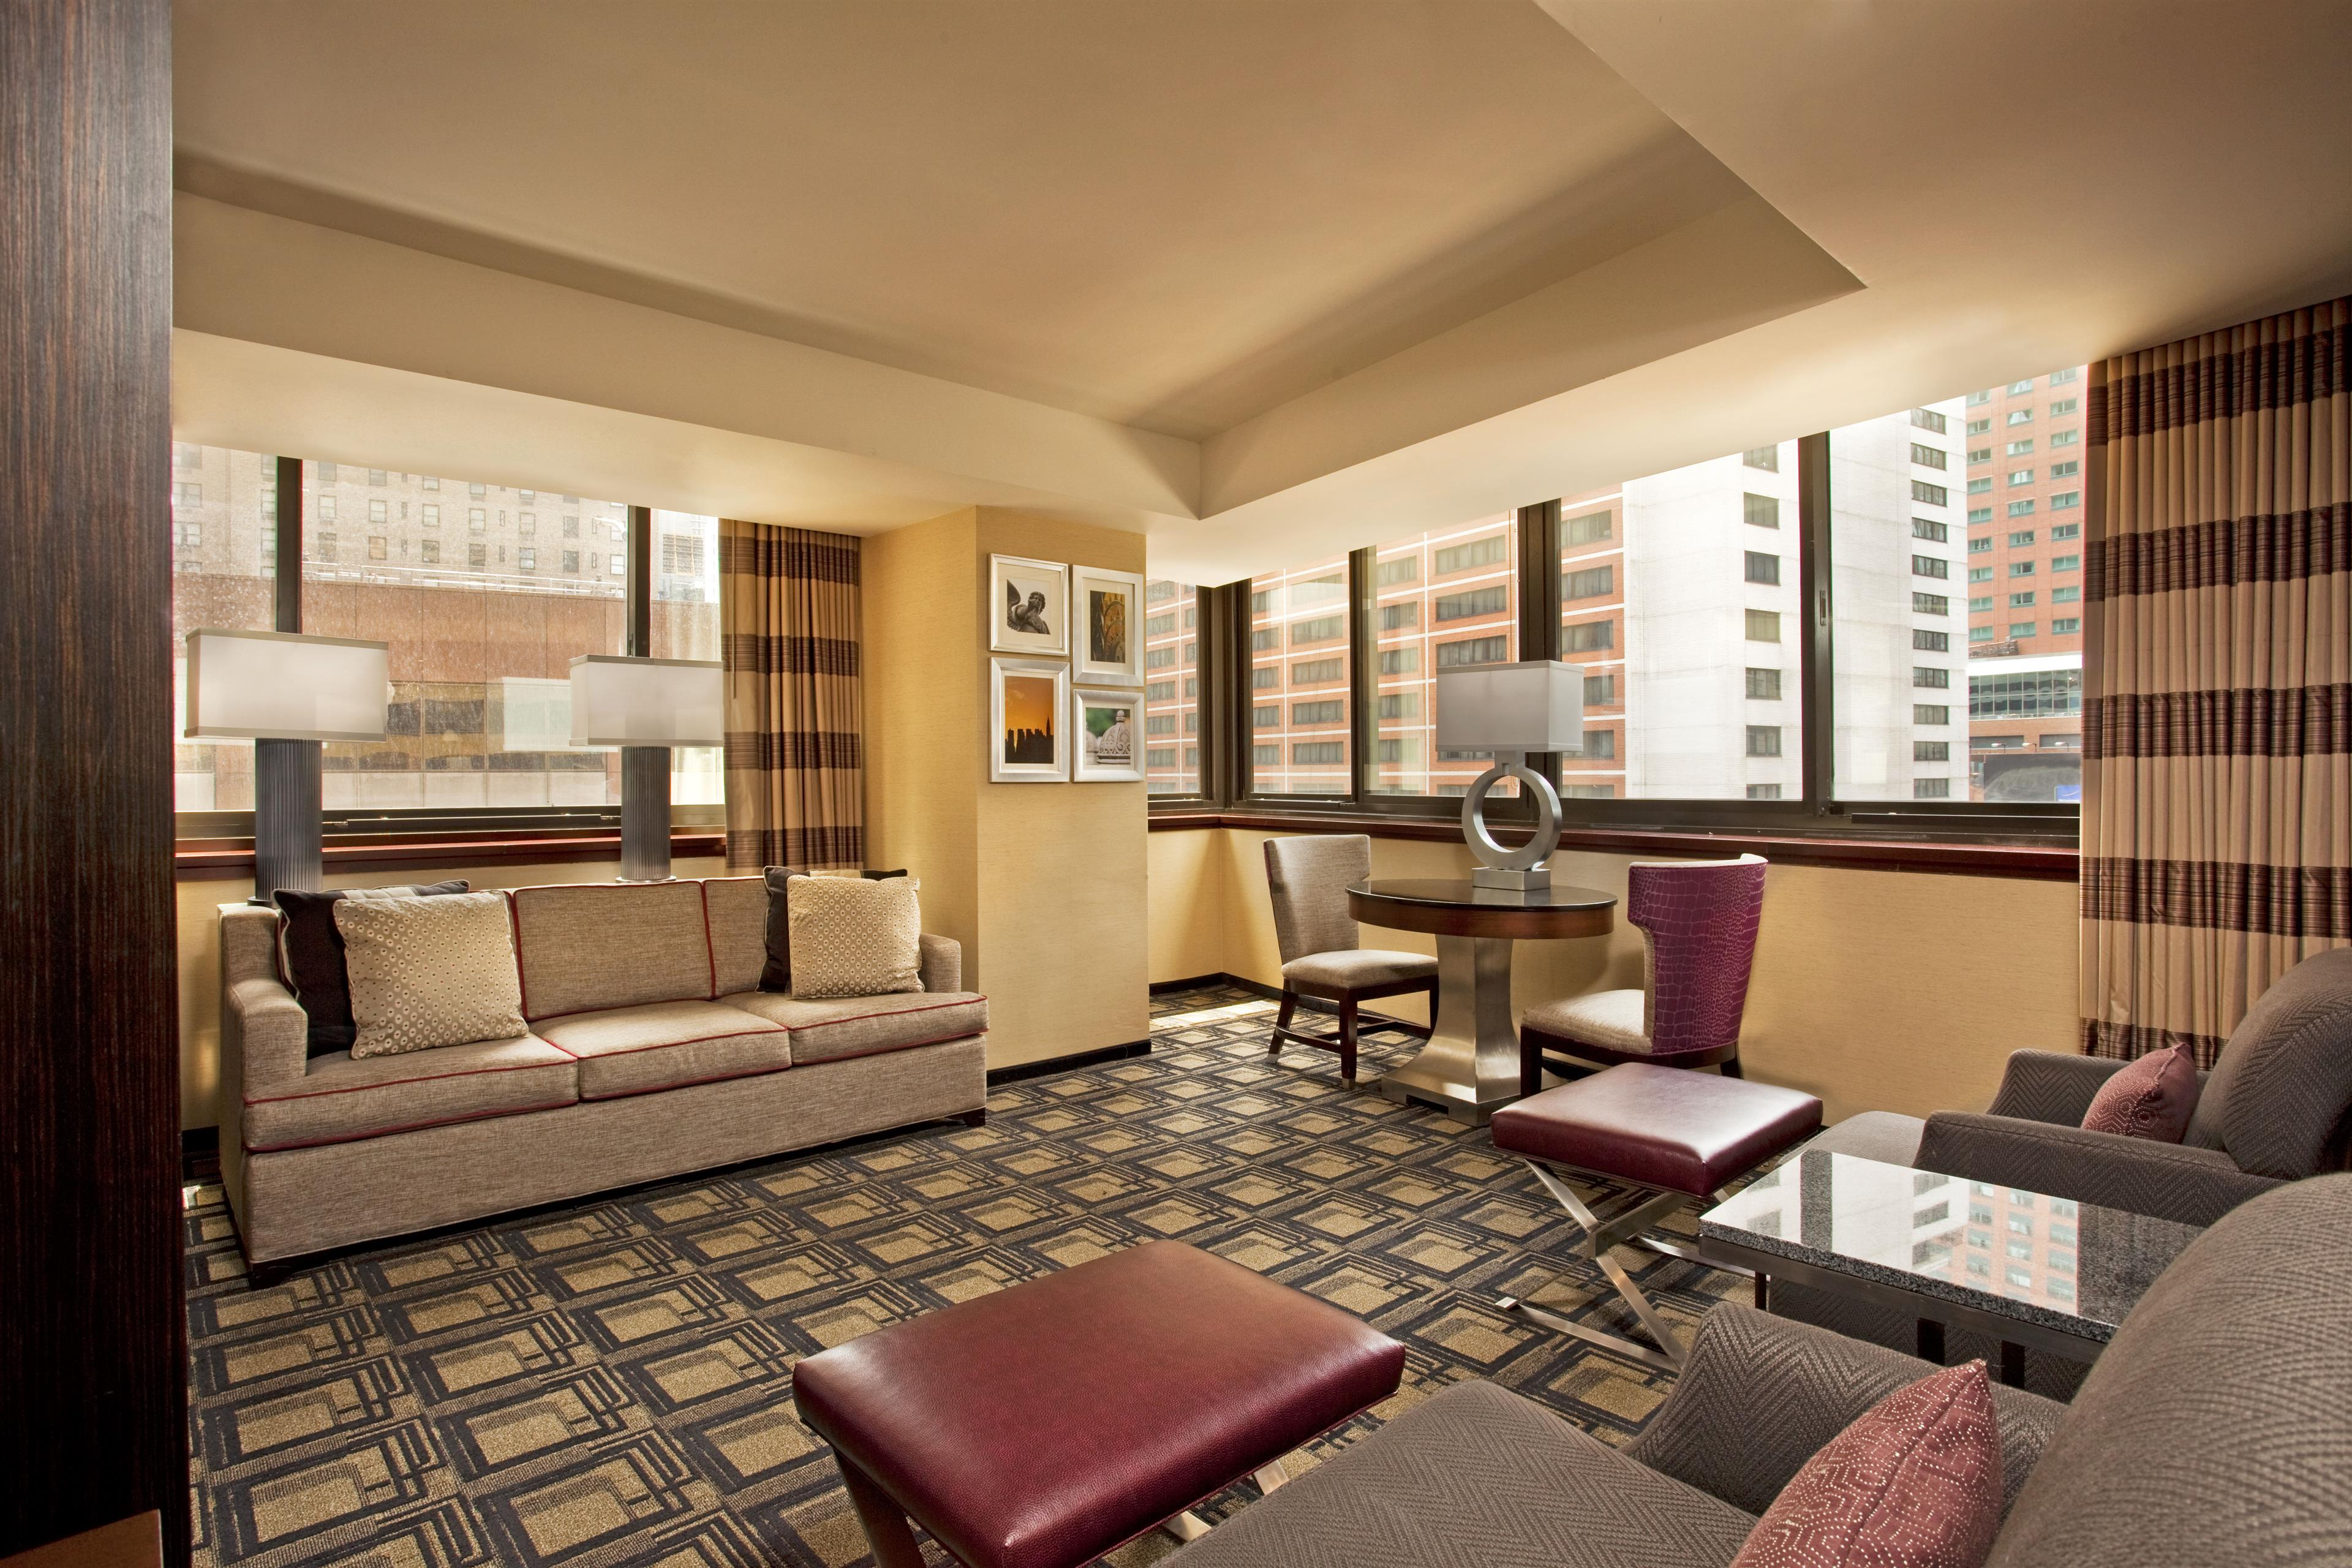 Sheraton New York Times Square Hotel image 2